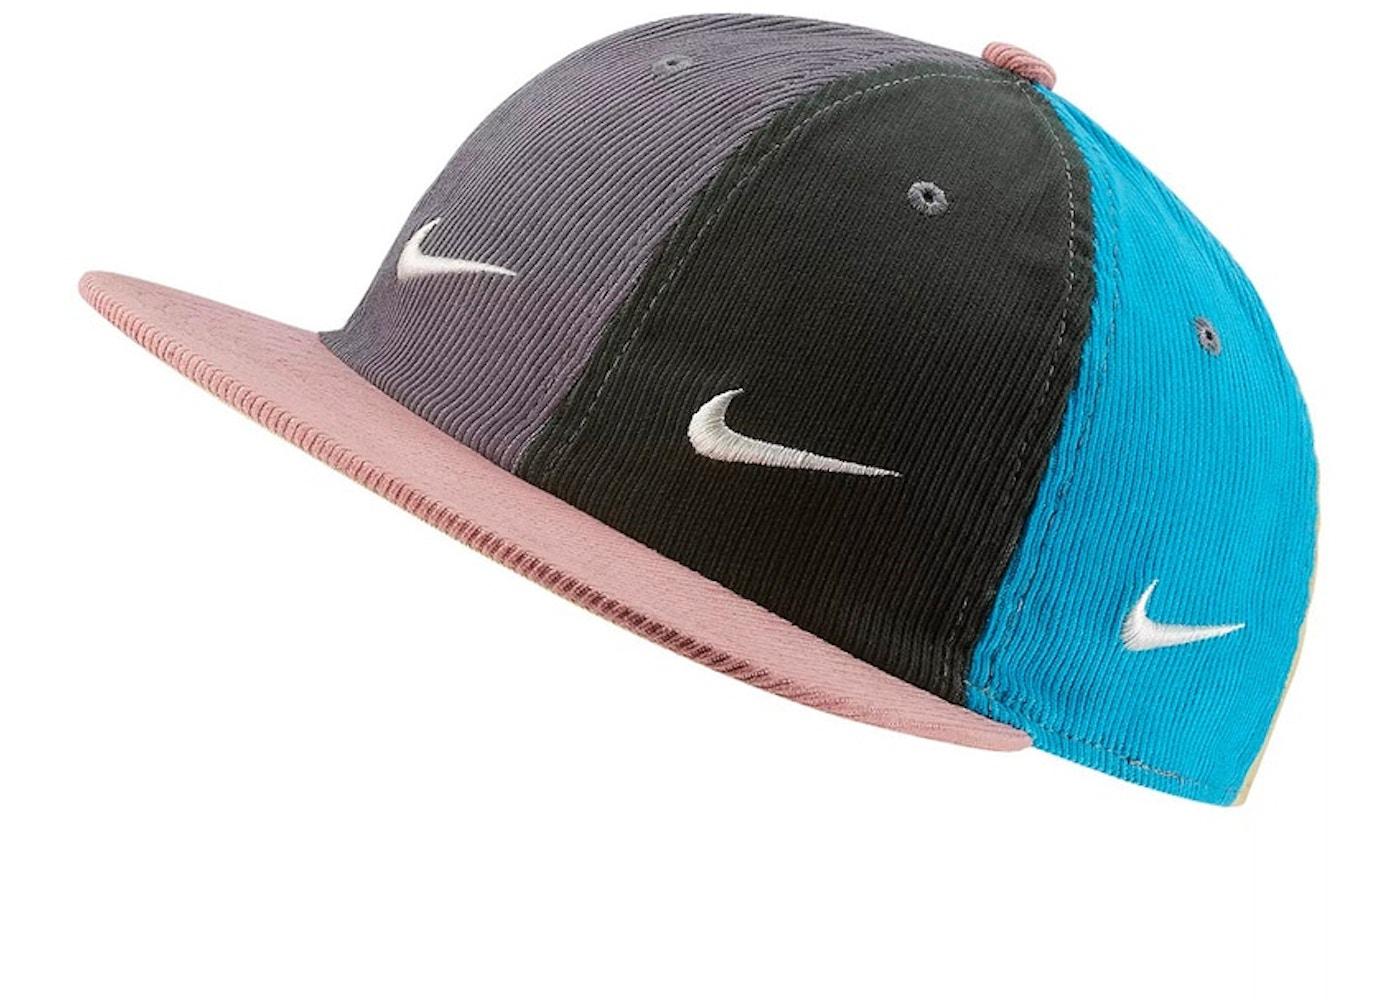 online retailer 422c7 c1f18 Nike Sean Wotherspoon Heritage  86 Quickstrike Cap Multicolor. Sean  Wotherspoon Heritage  86 Quickstrike